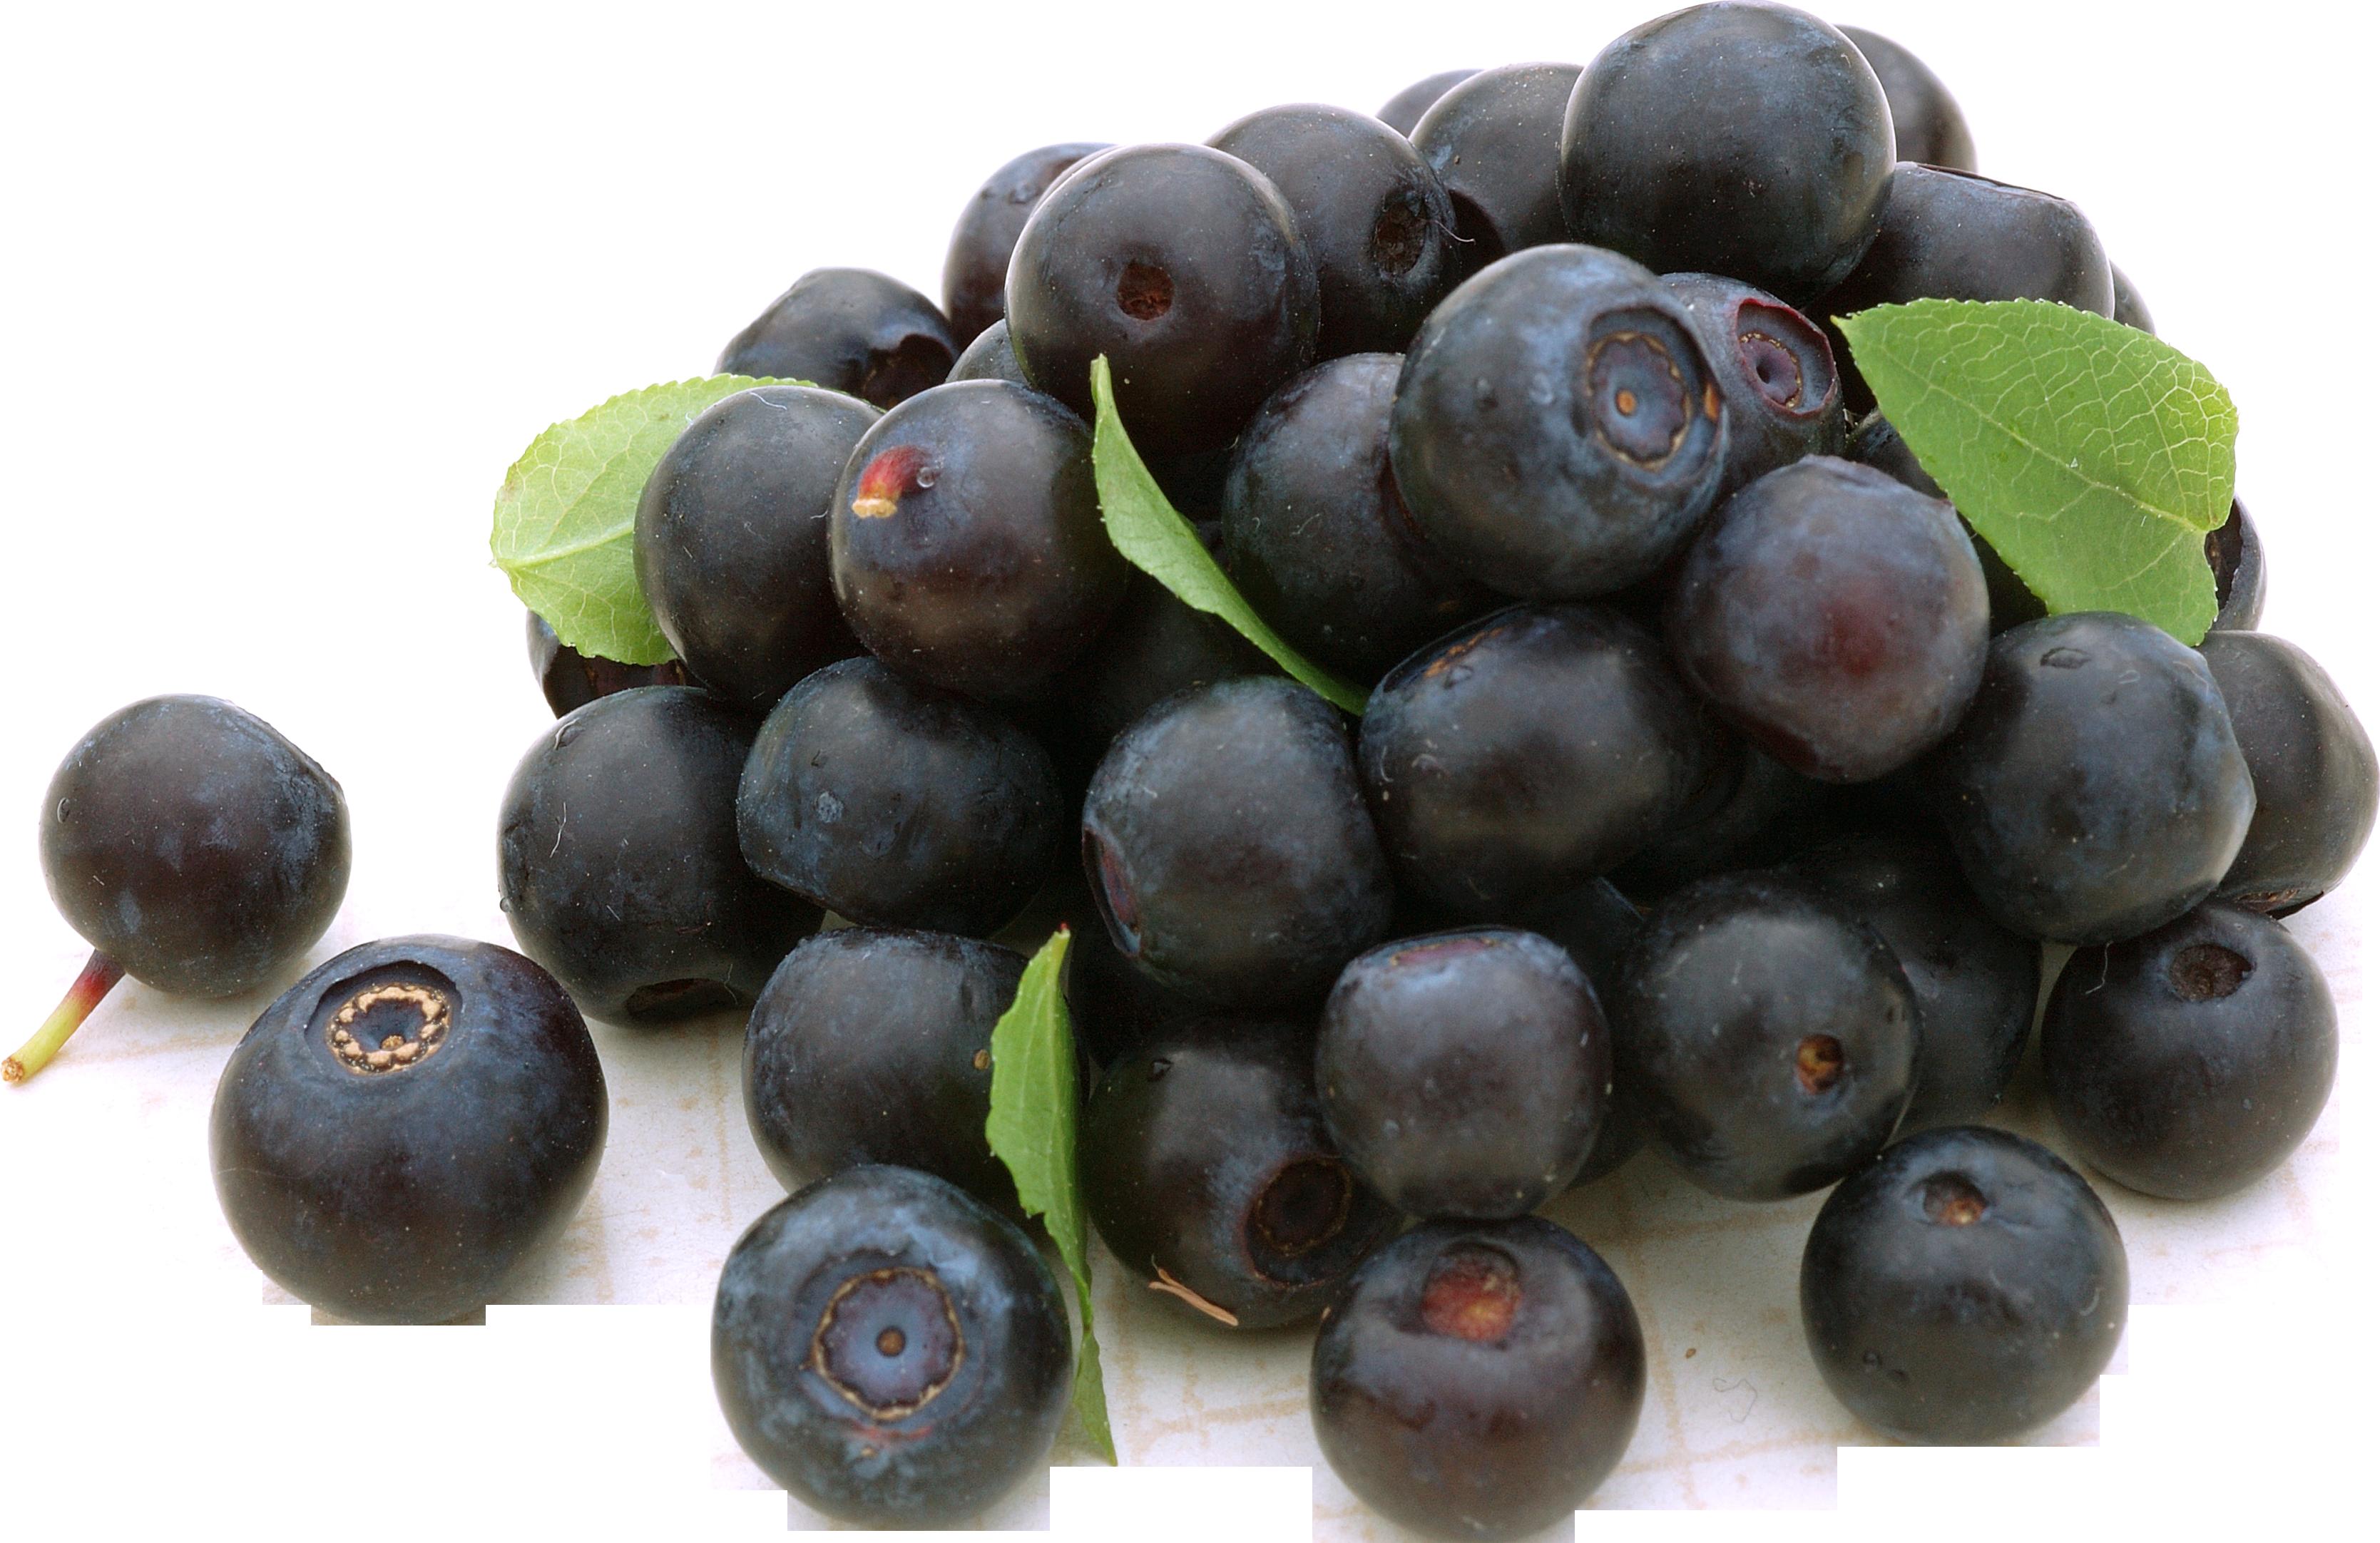 Blueberrys